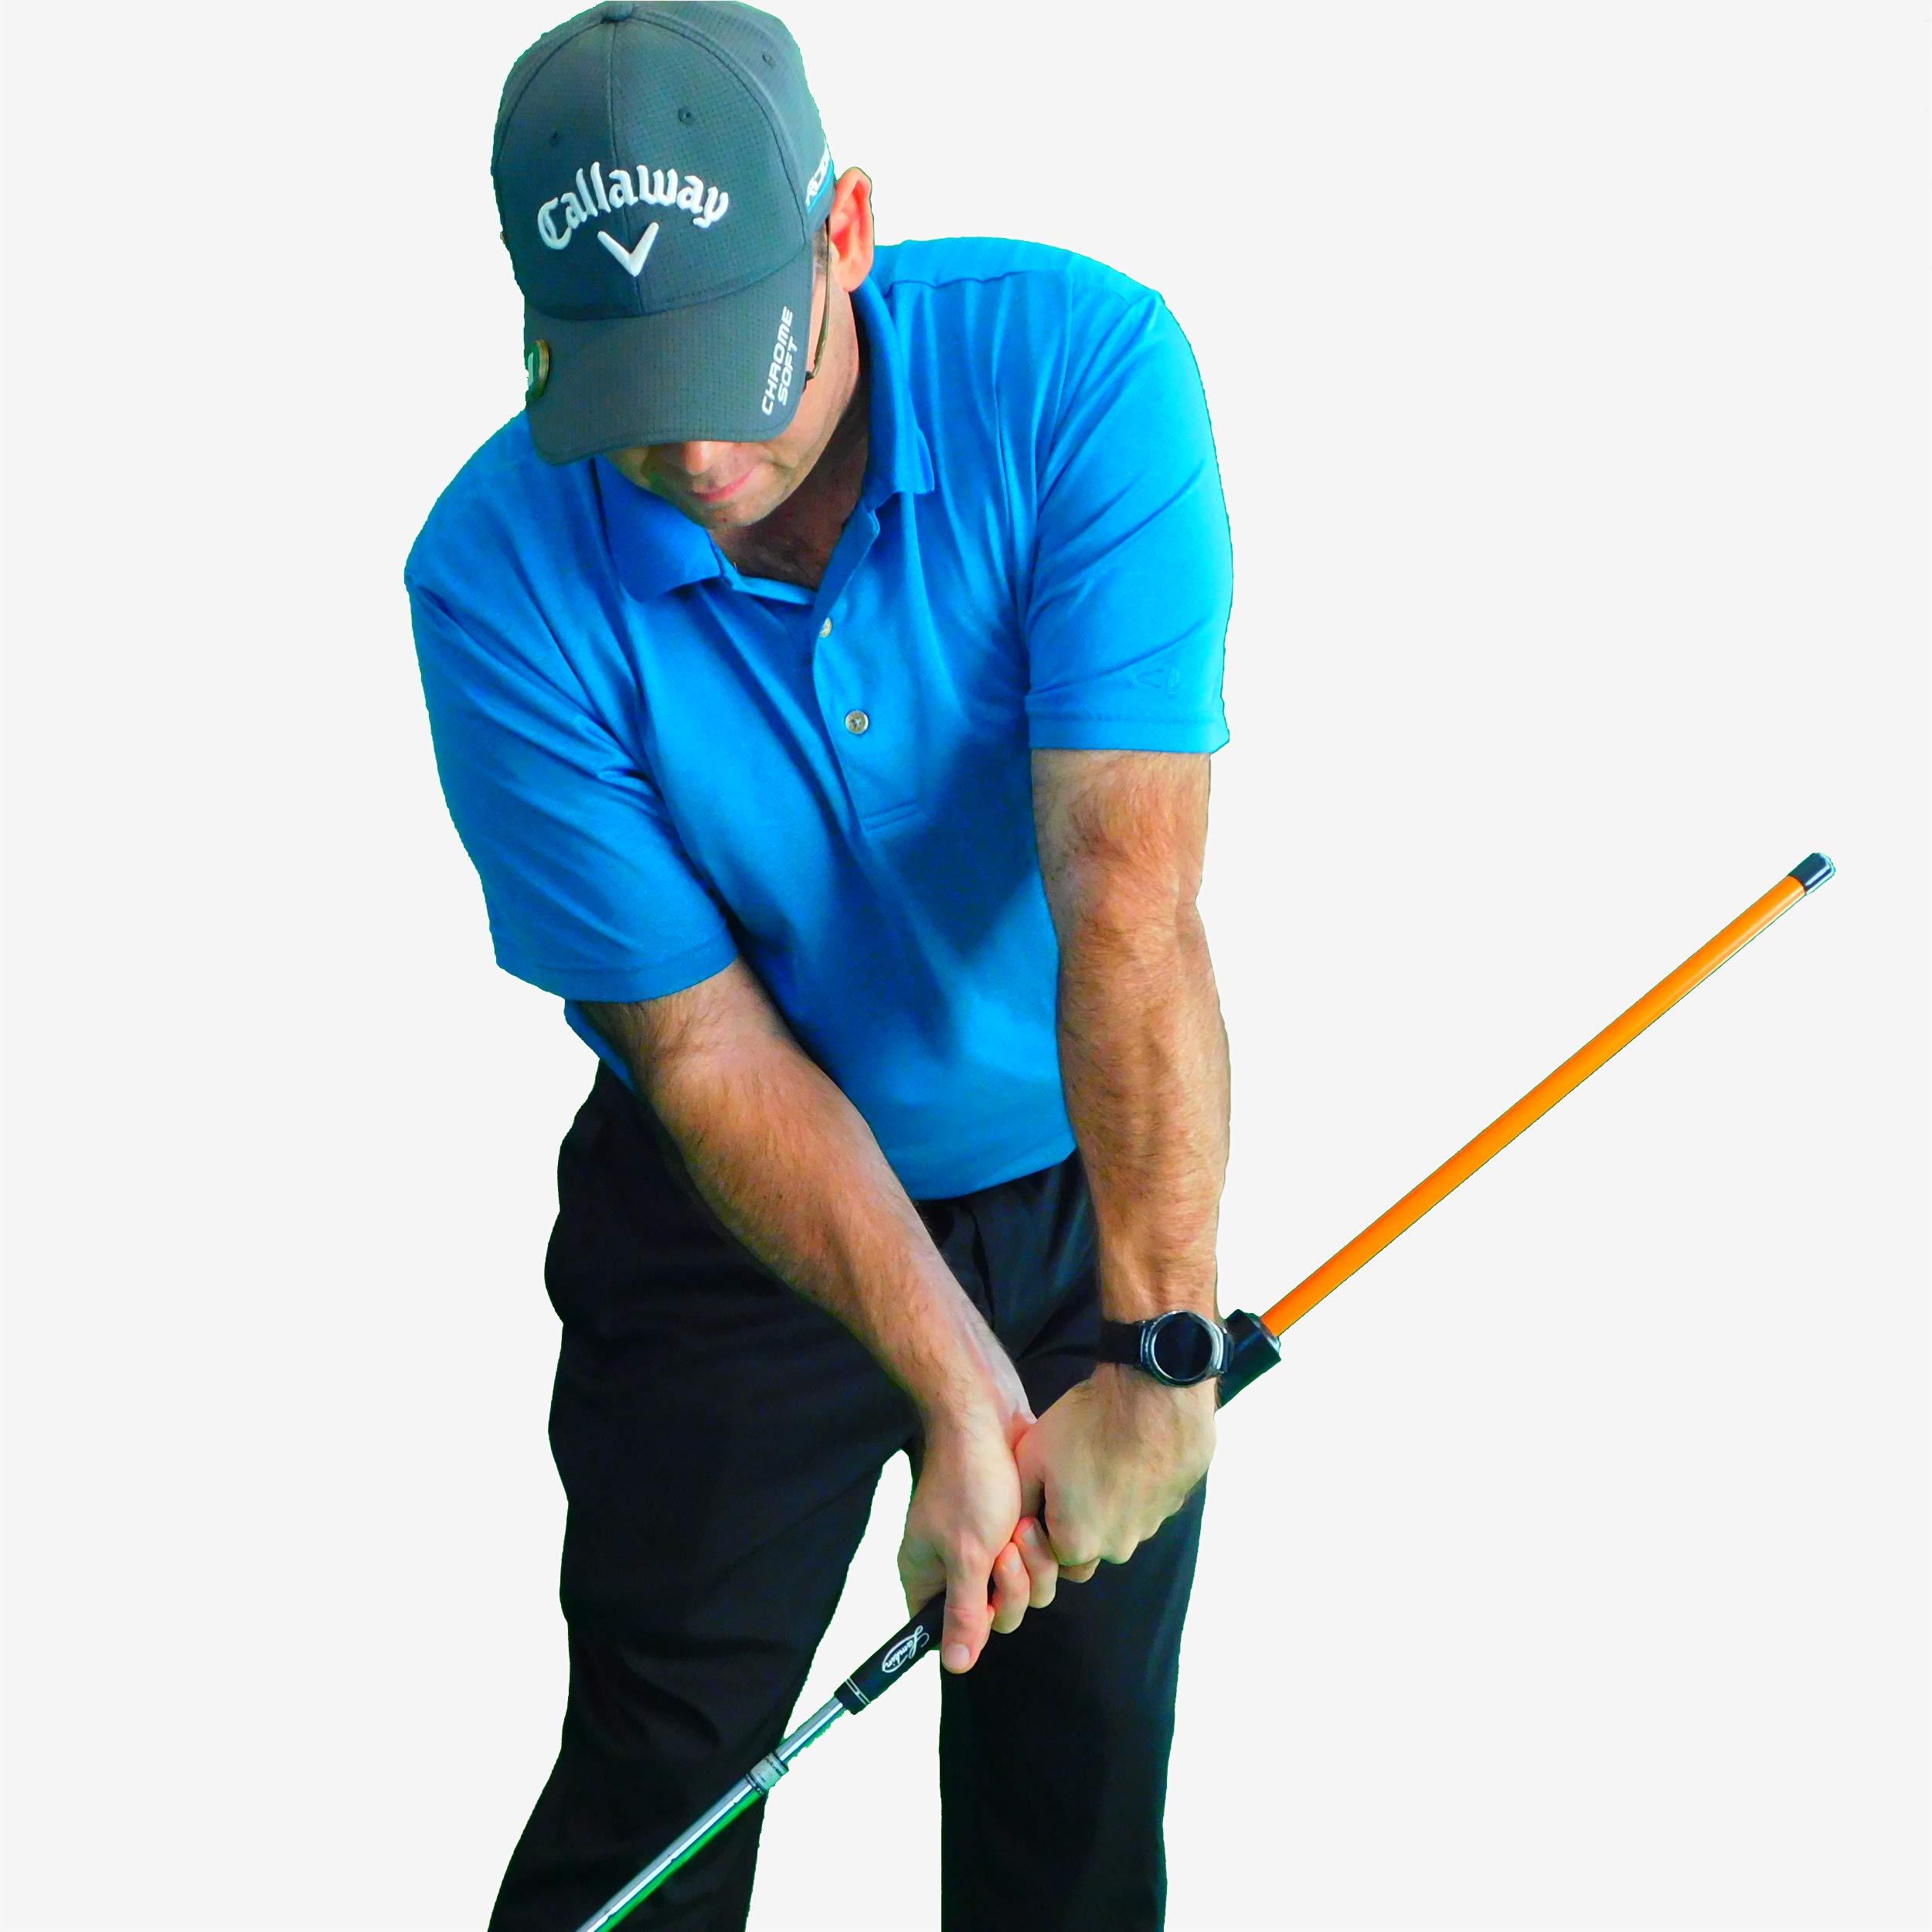 Anti Flip Stick Training Chipping Practice